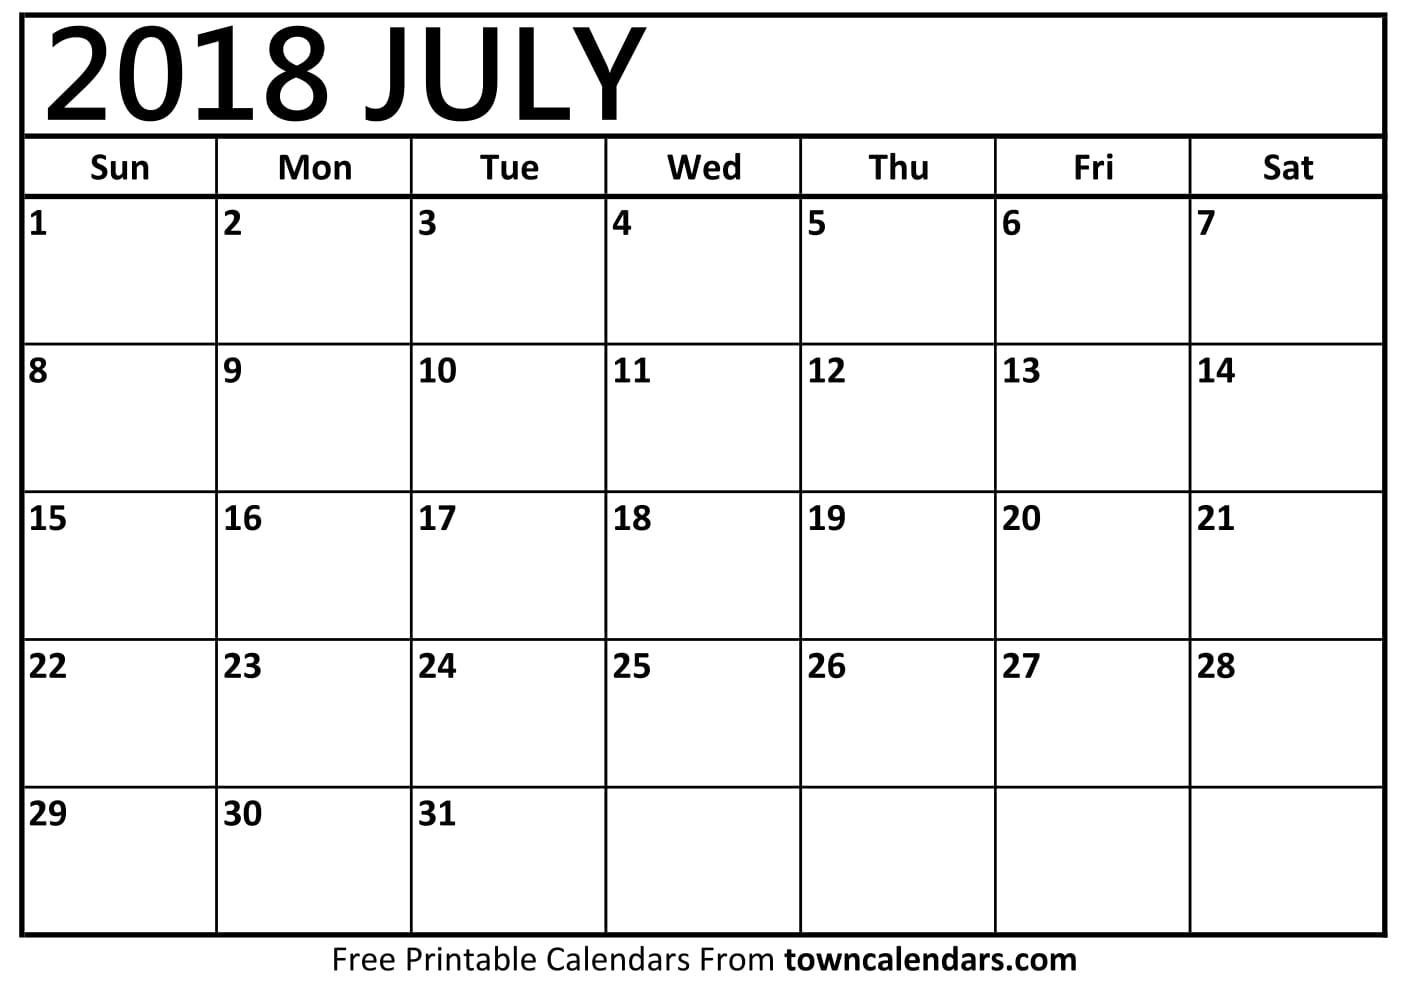 july 2018 Printable July 2018 Calendar   towncalendars.com july 2018